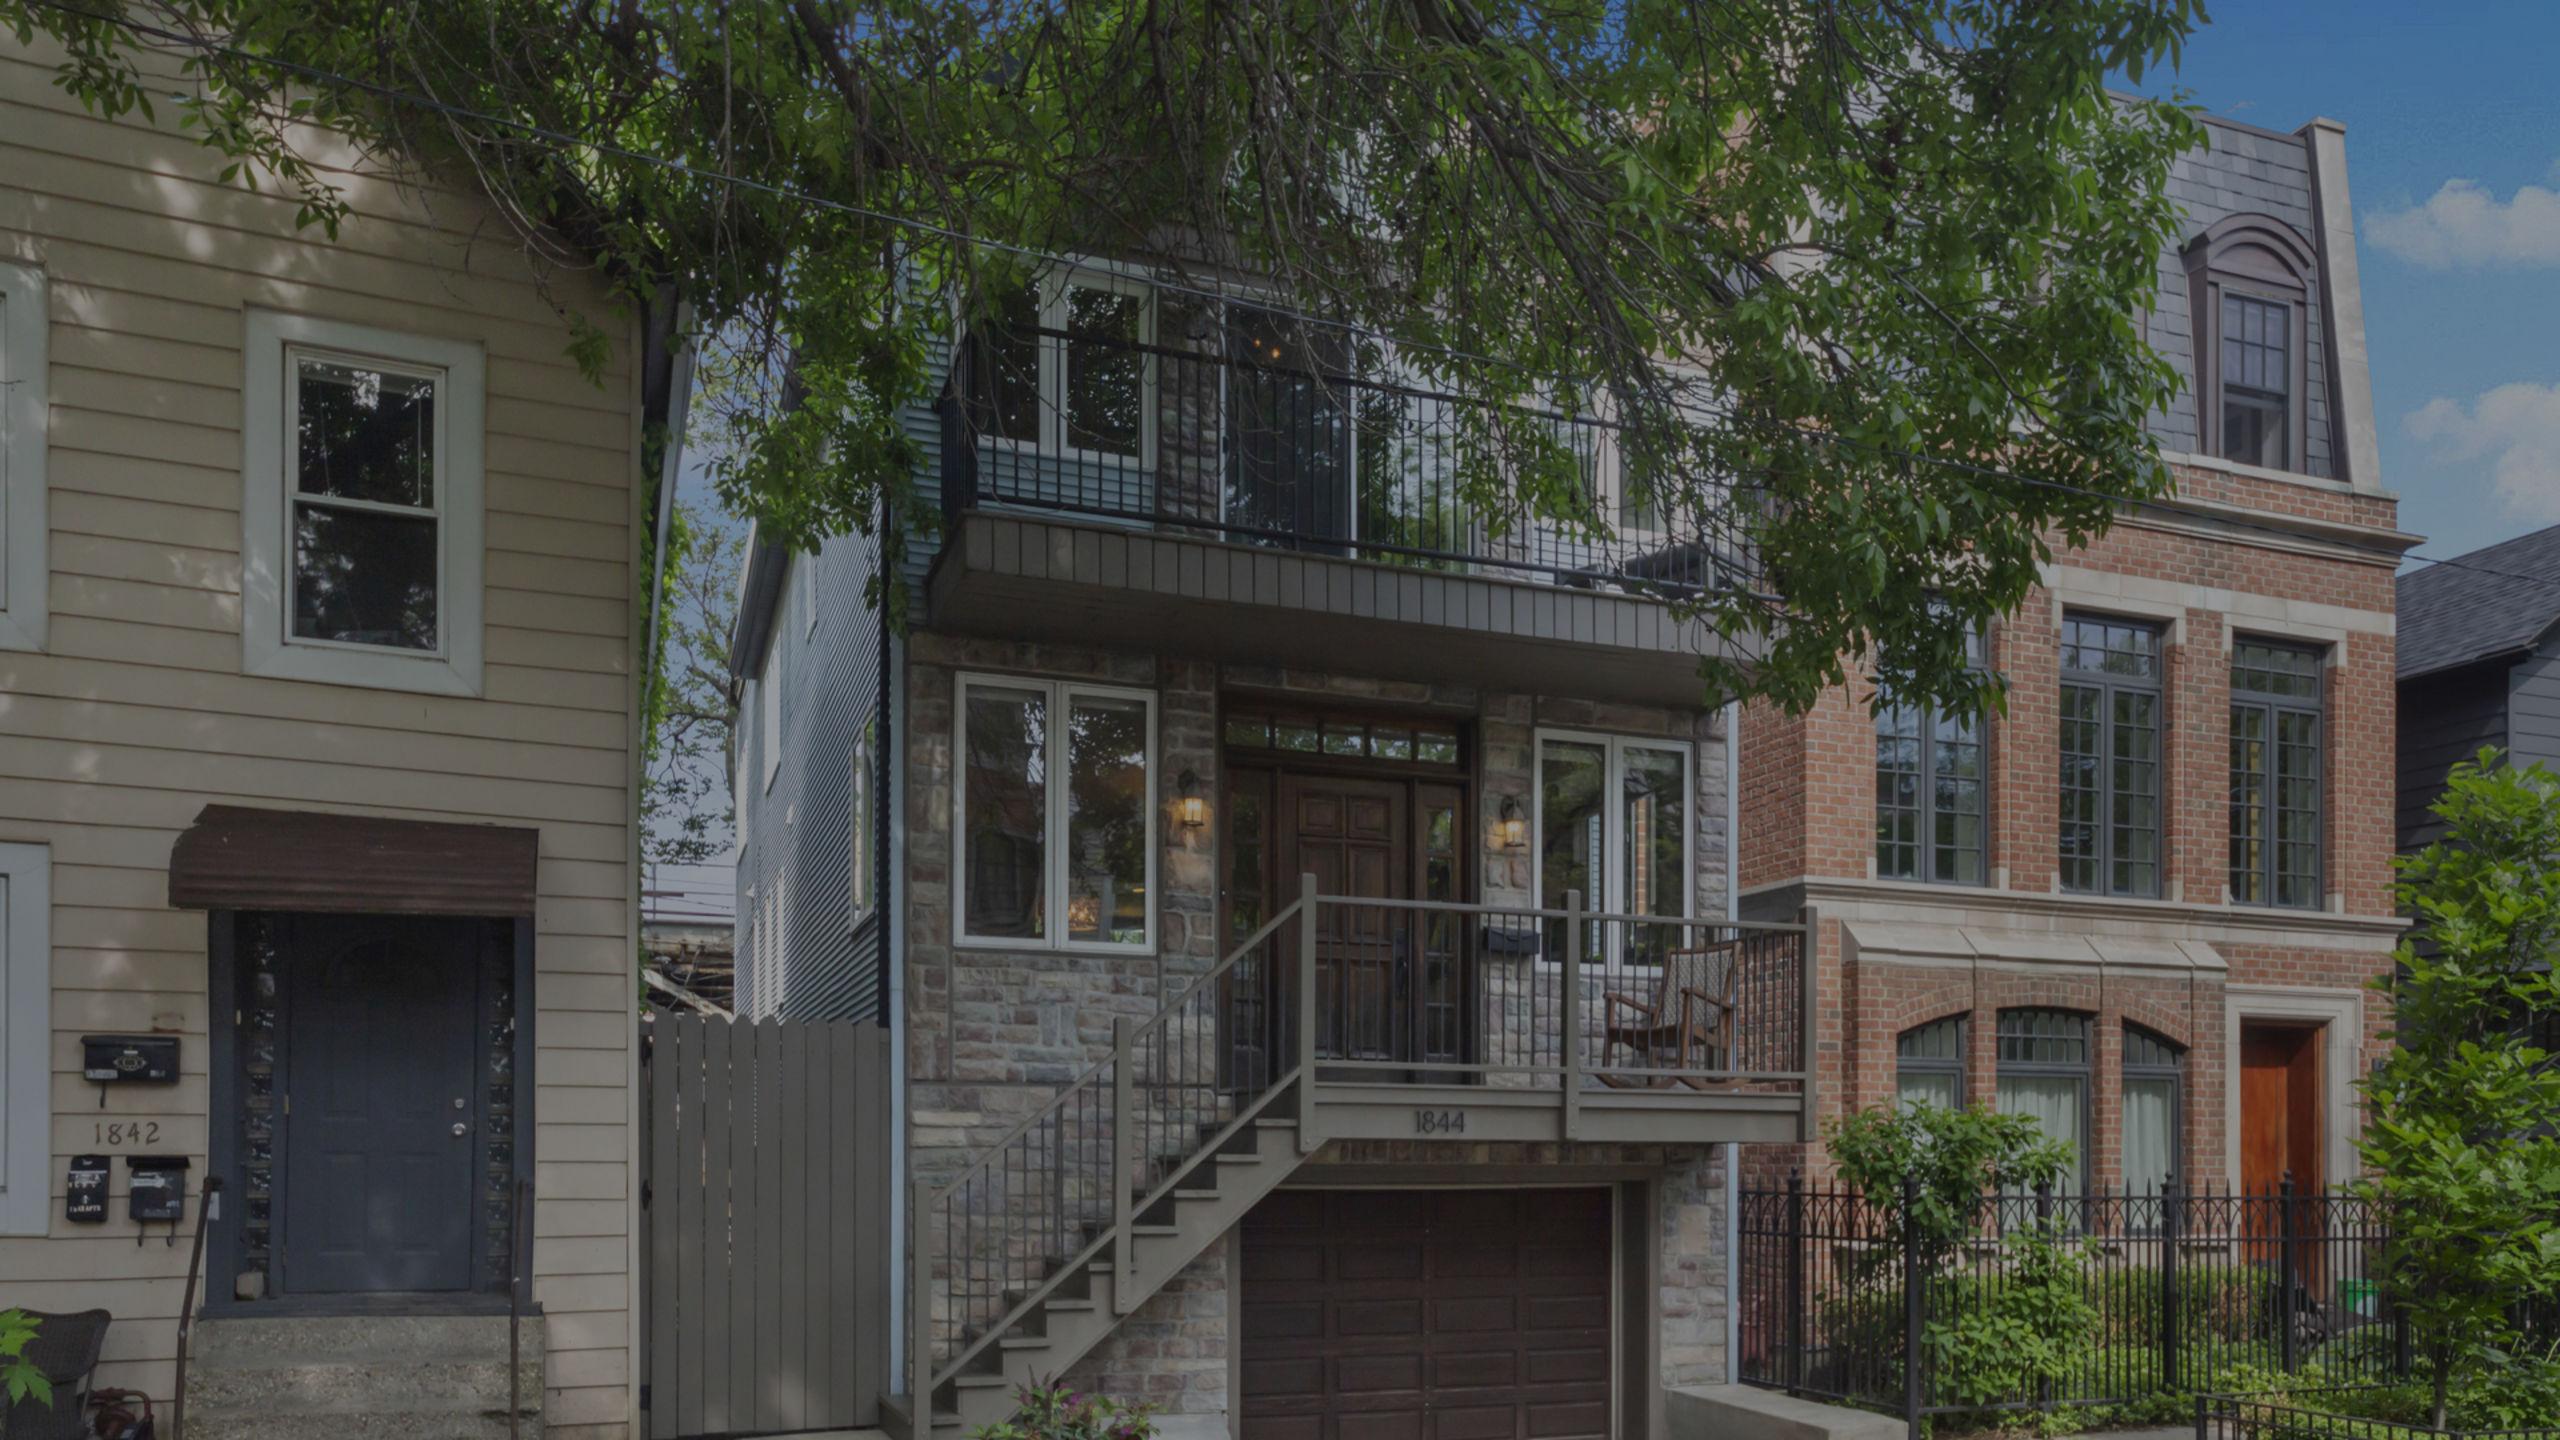 1844 N Bissell St , Chicago, IL 60614